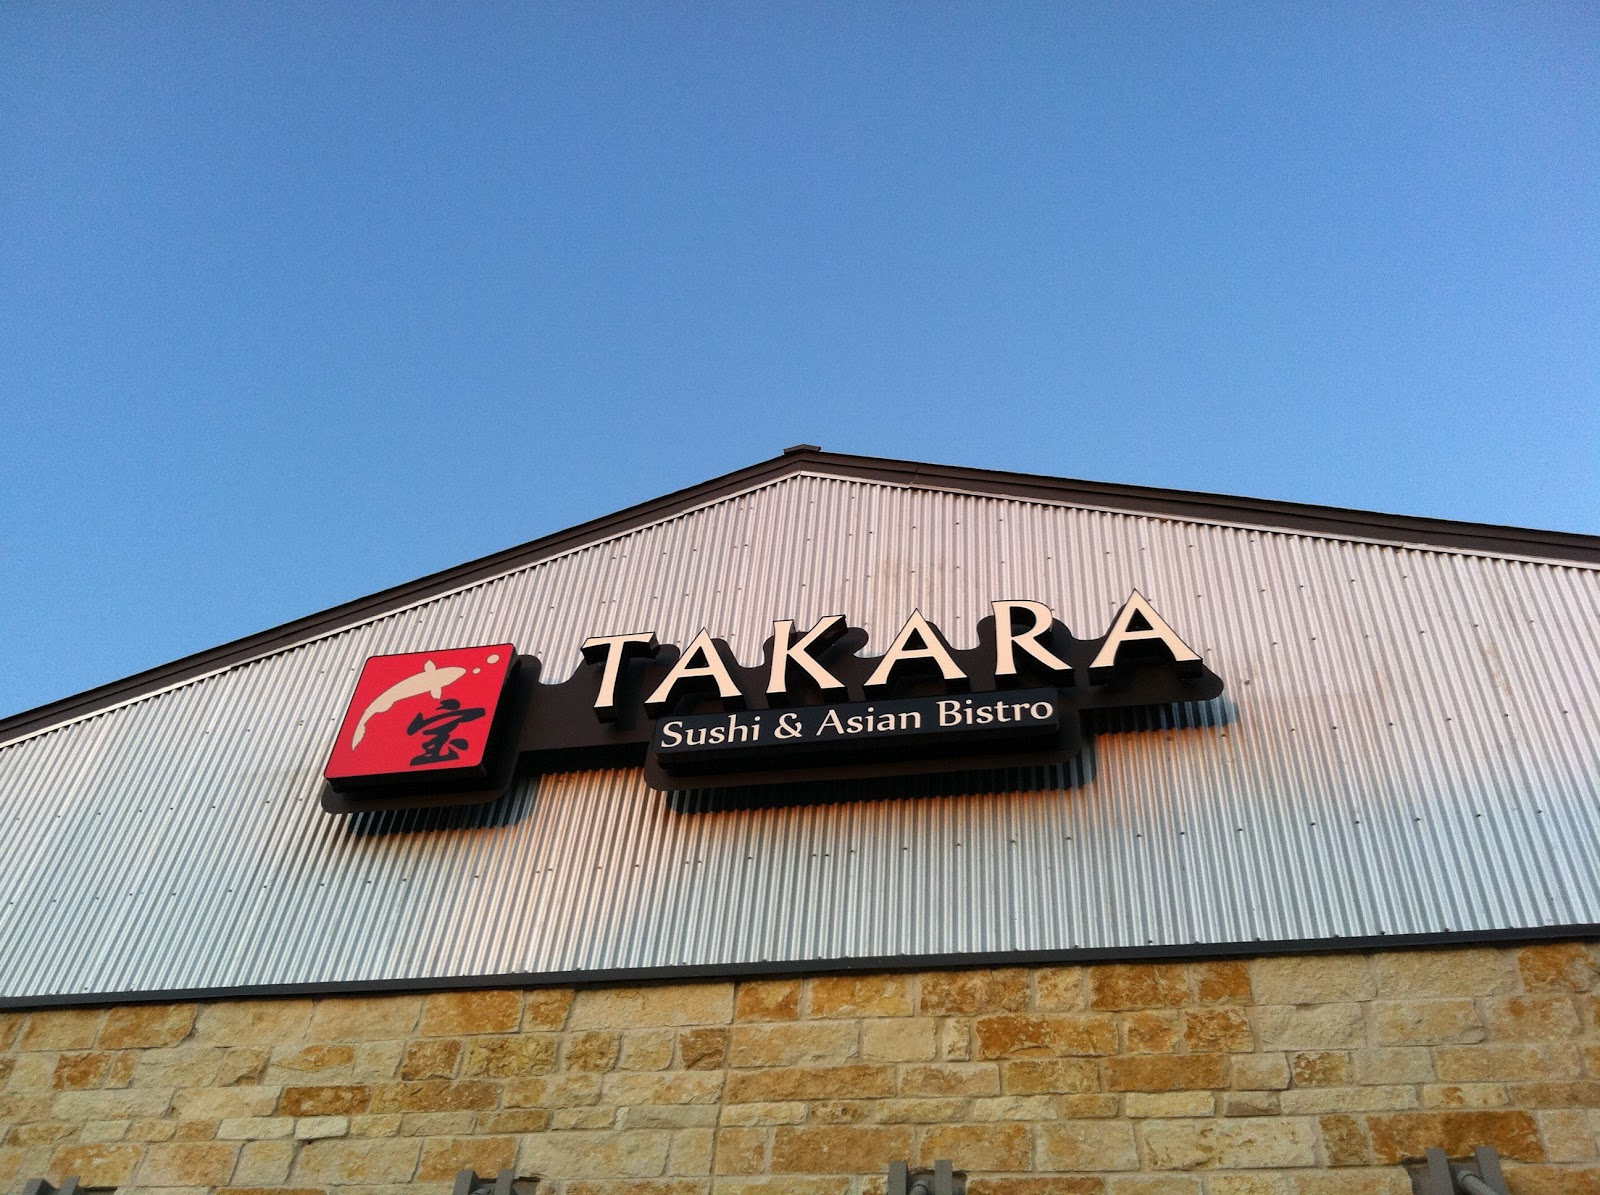 Takara Sushi & Asian Bistro | Sushi in the ATX